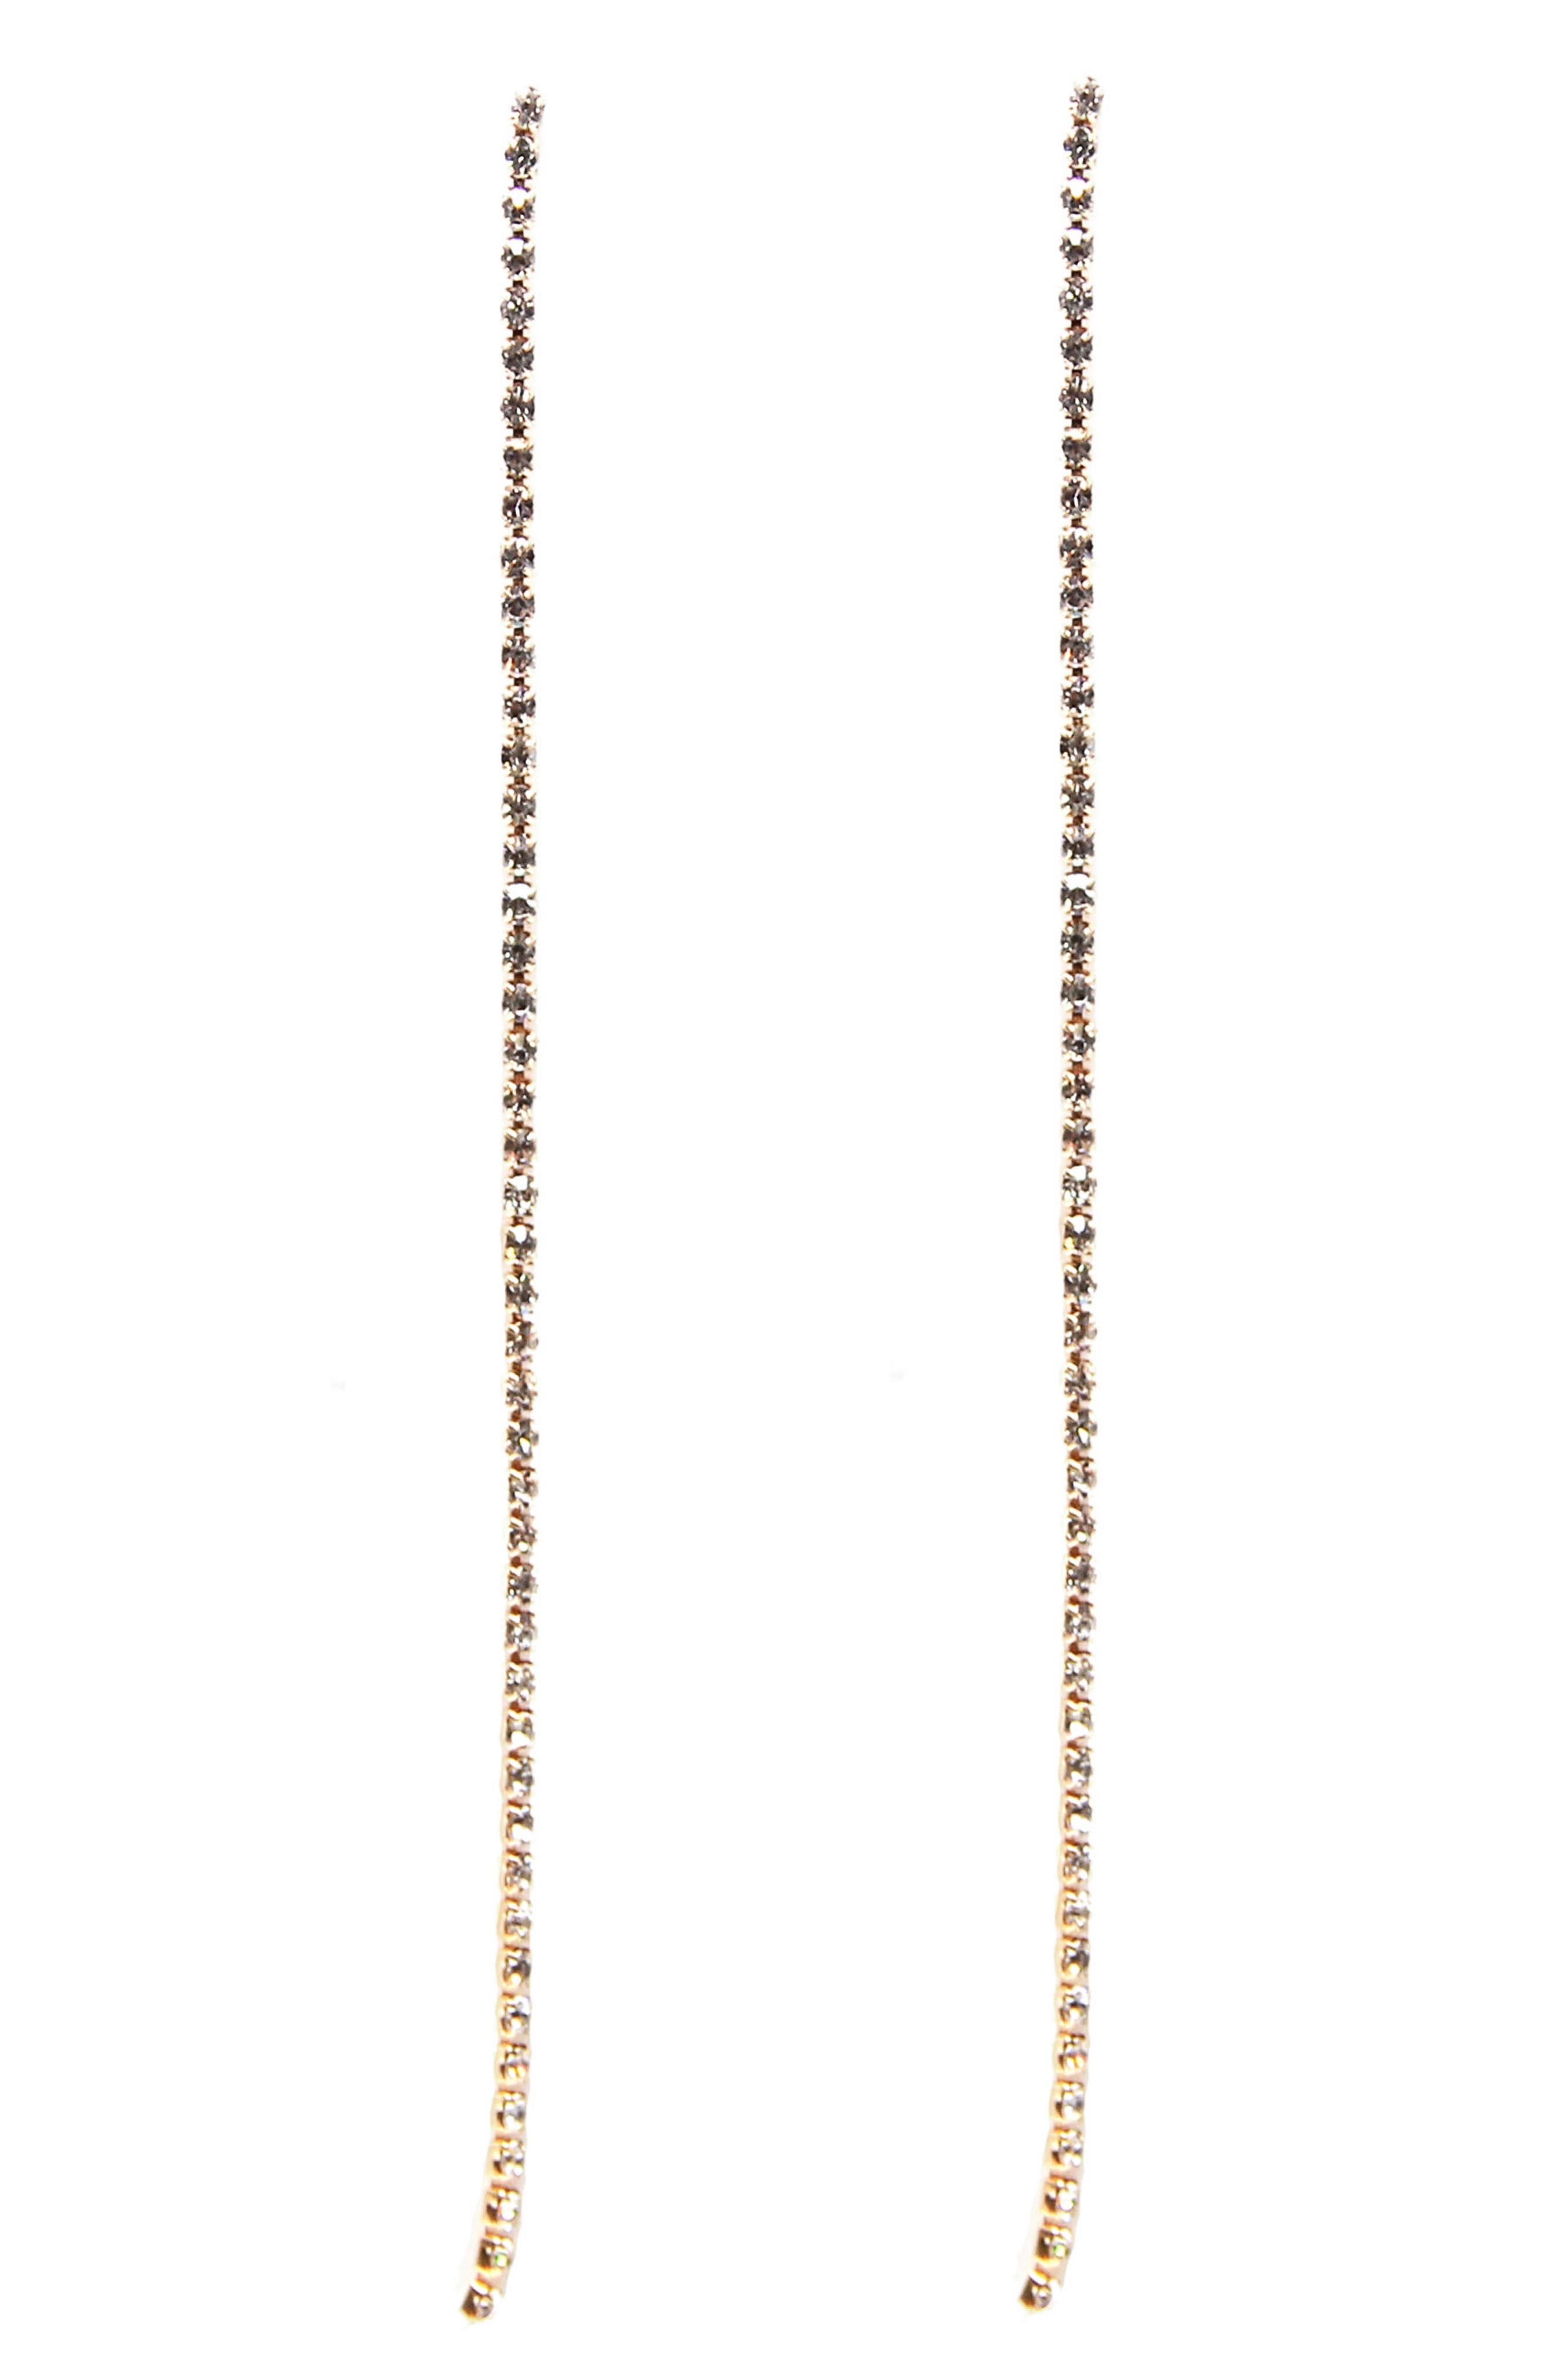 Crystal Chain Earrings,                             Main thumbnail 1, color,                             710